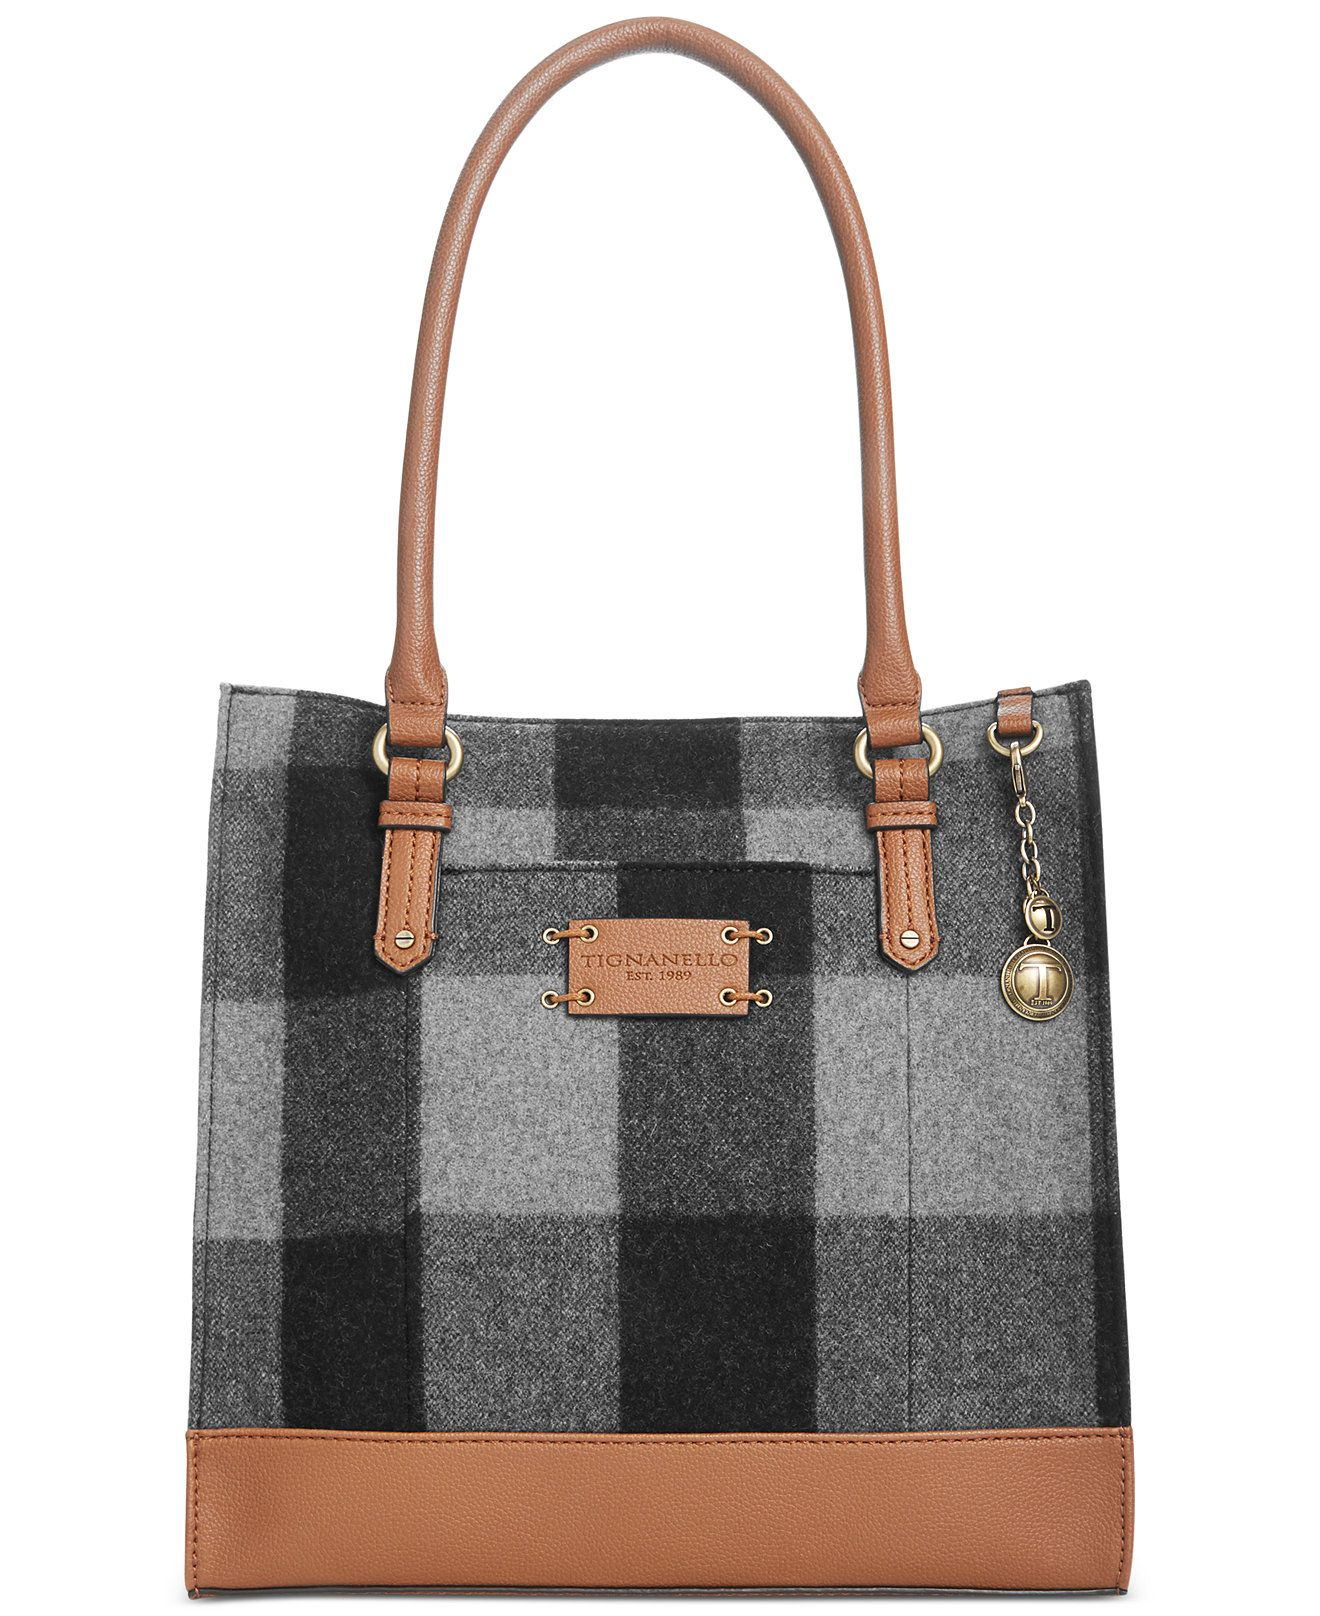 Tignanello Lexington Wool Check Tote Clearance Handbags Accessories Macy S